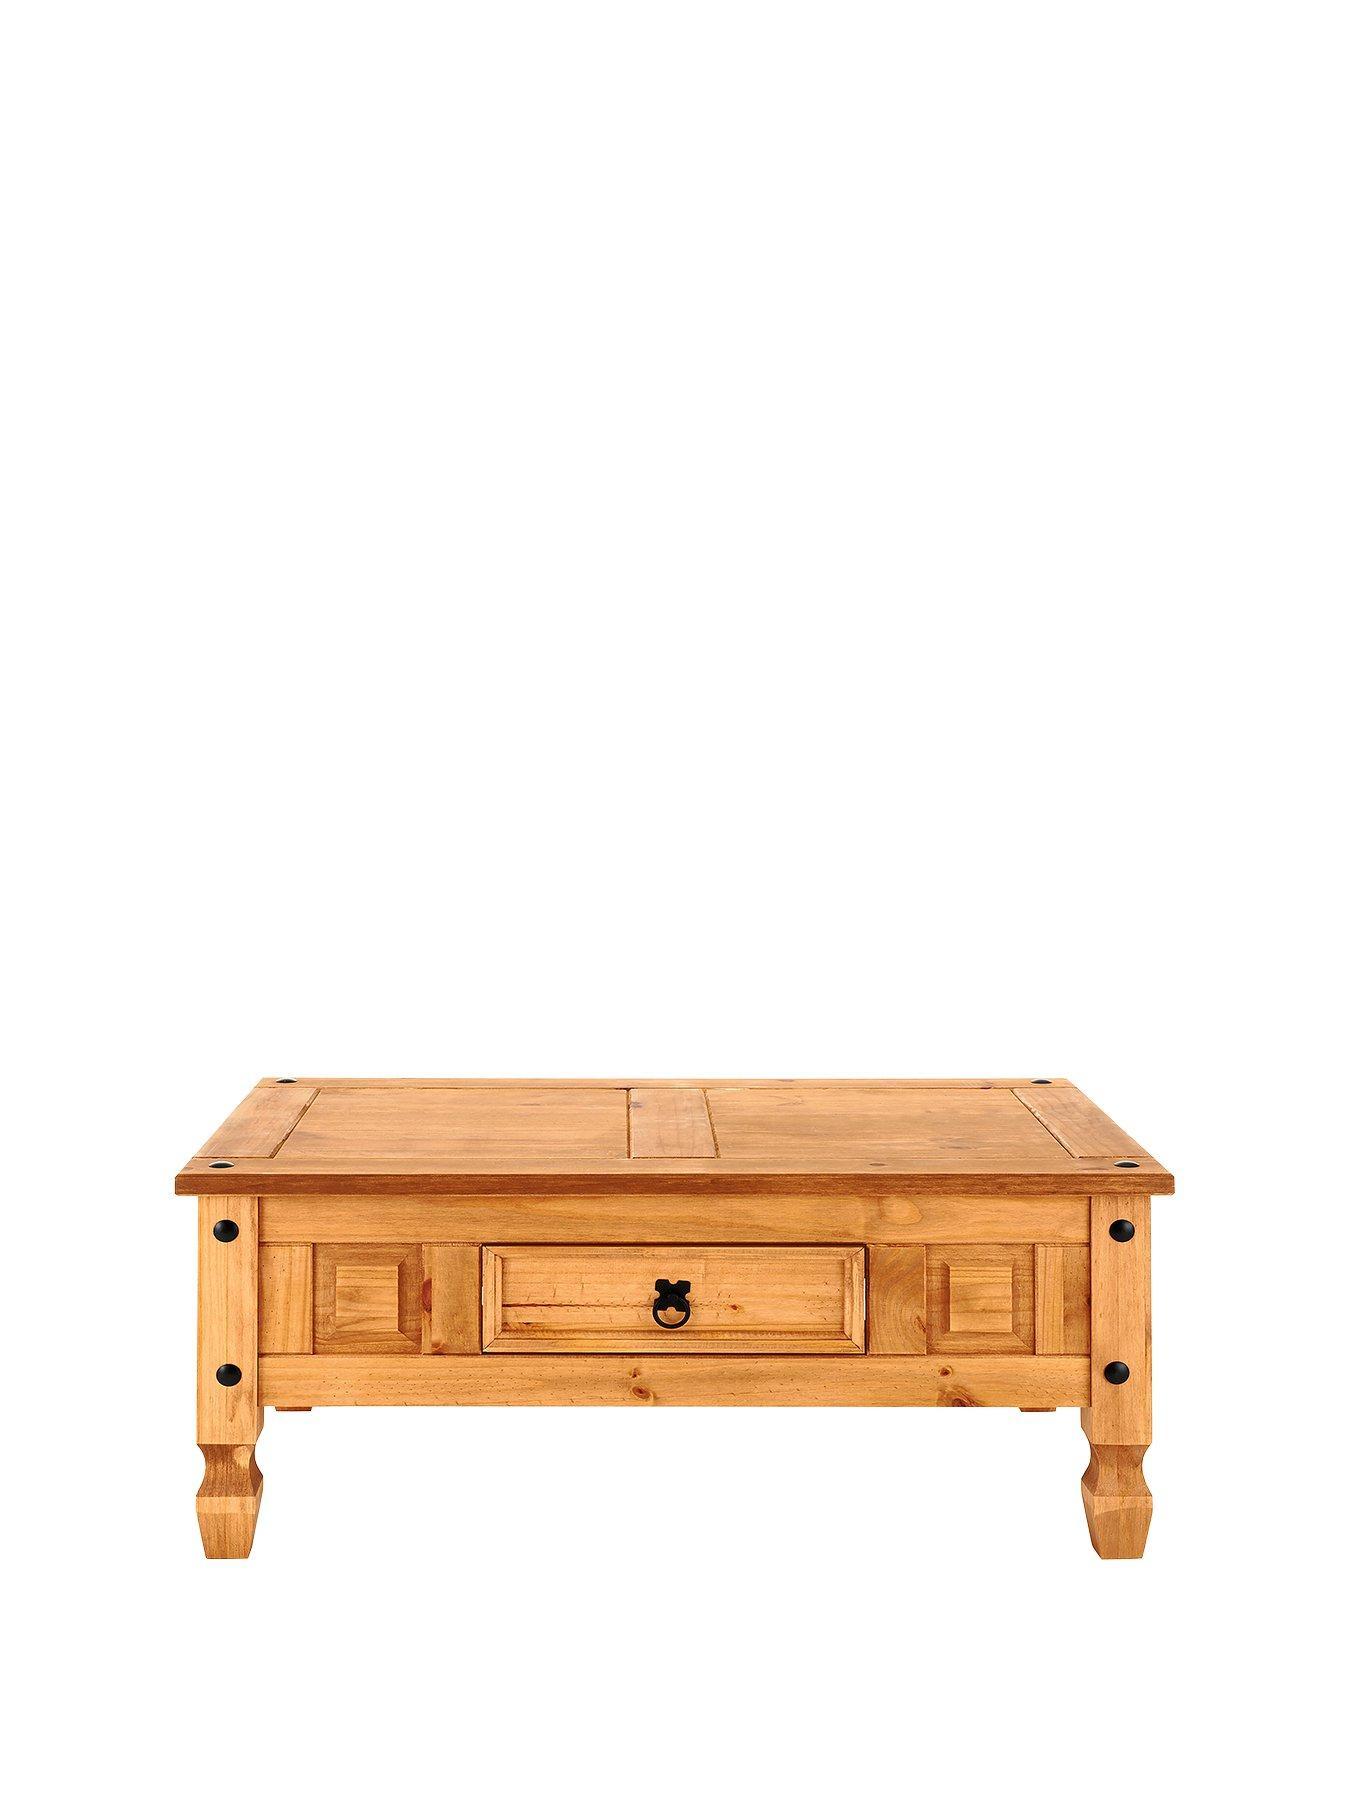 Corona Solid Pine Coffee Table littlewoodsirelandie